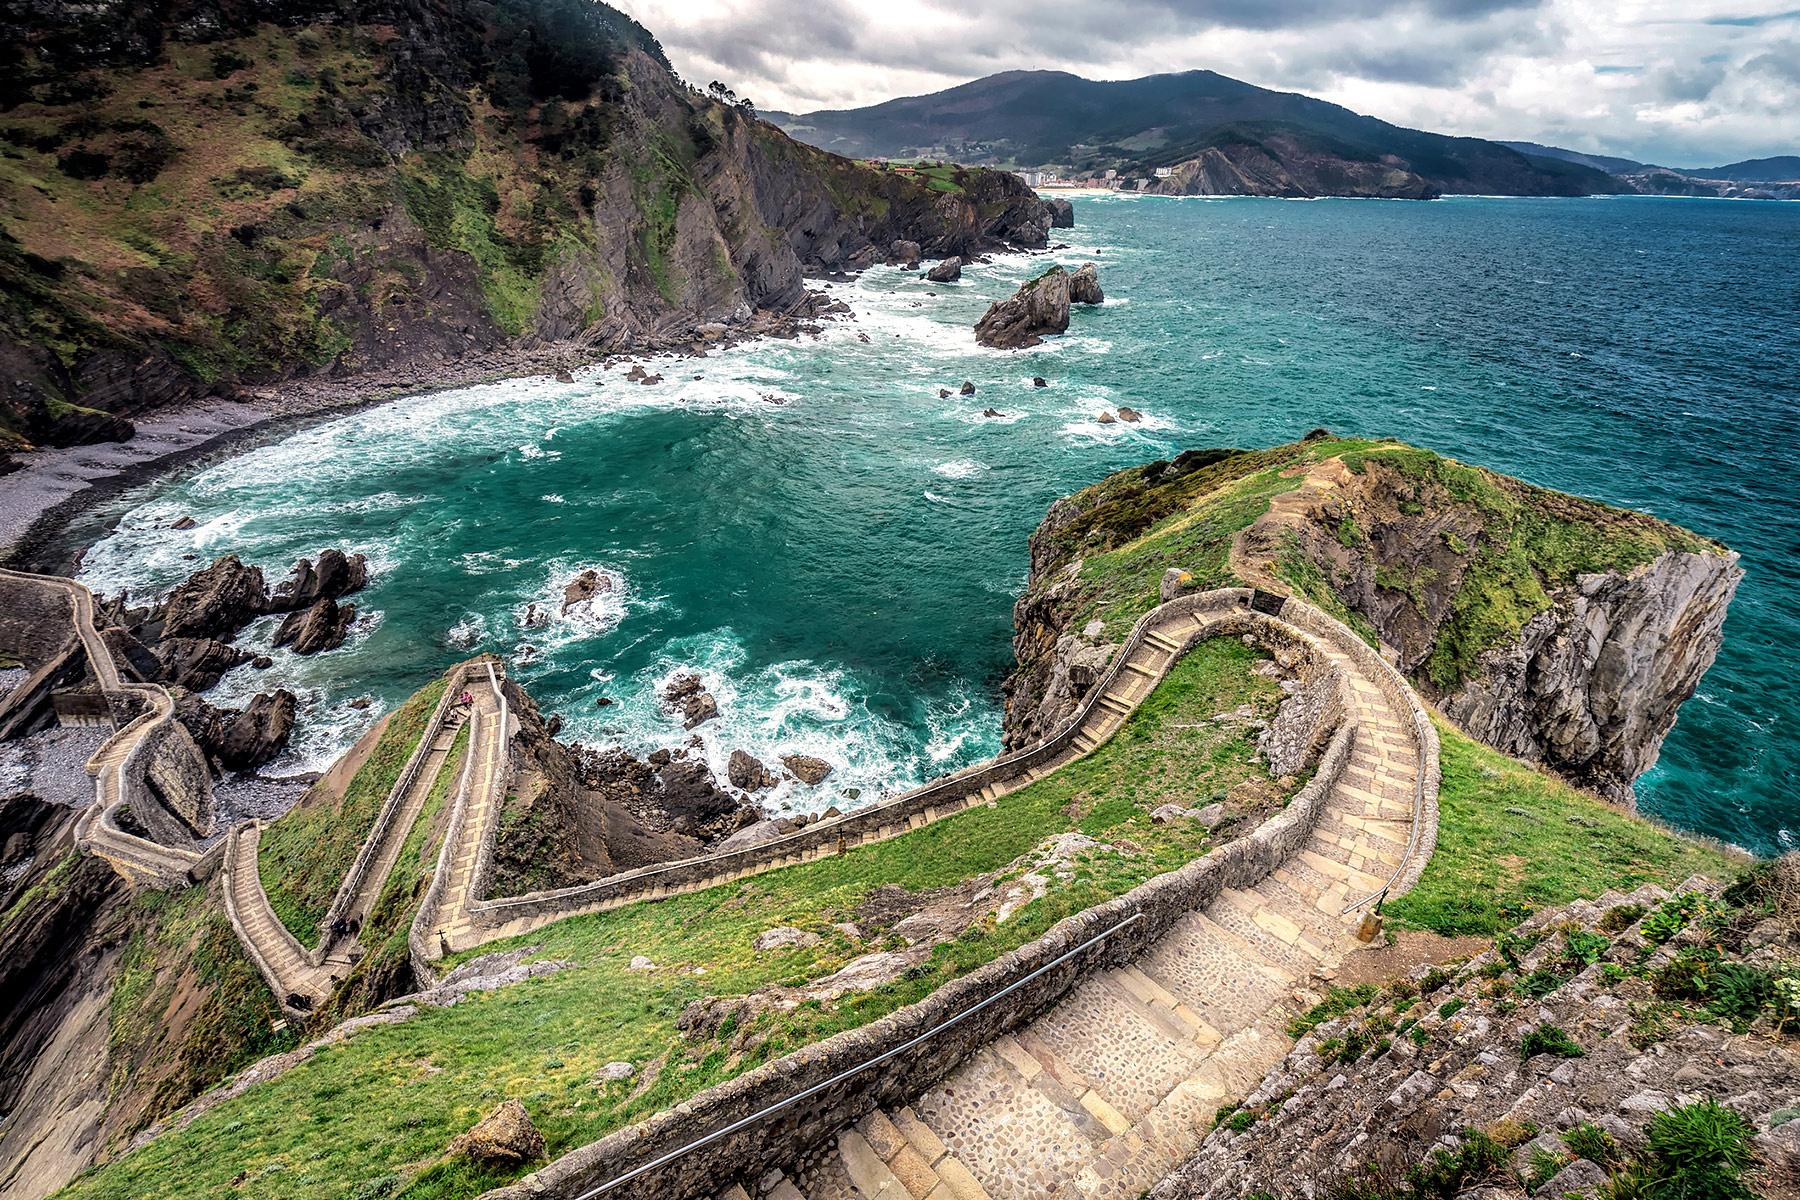 General 1800x1200 landscape Spain coast sea cliff